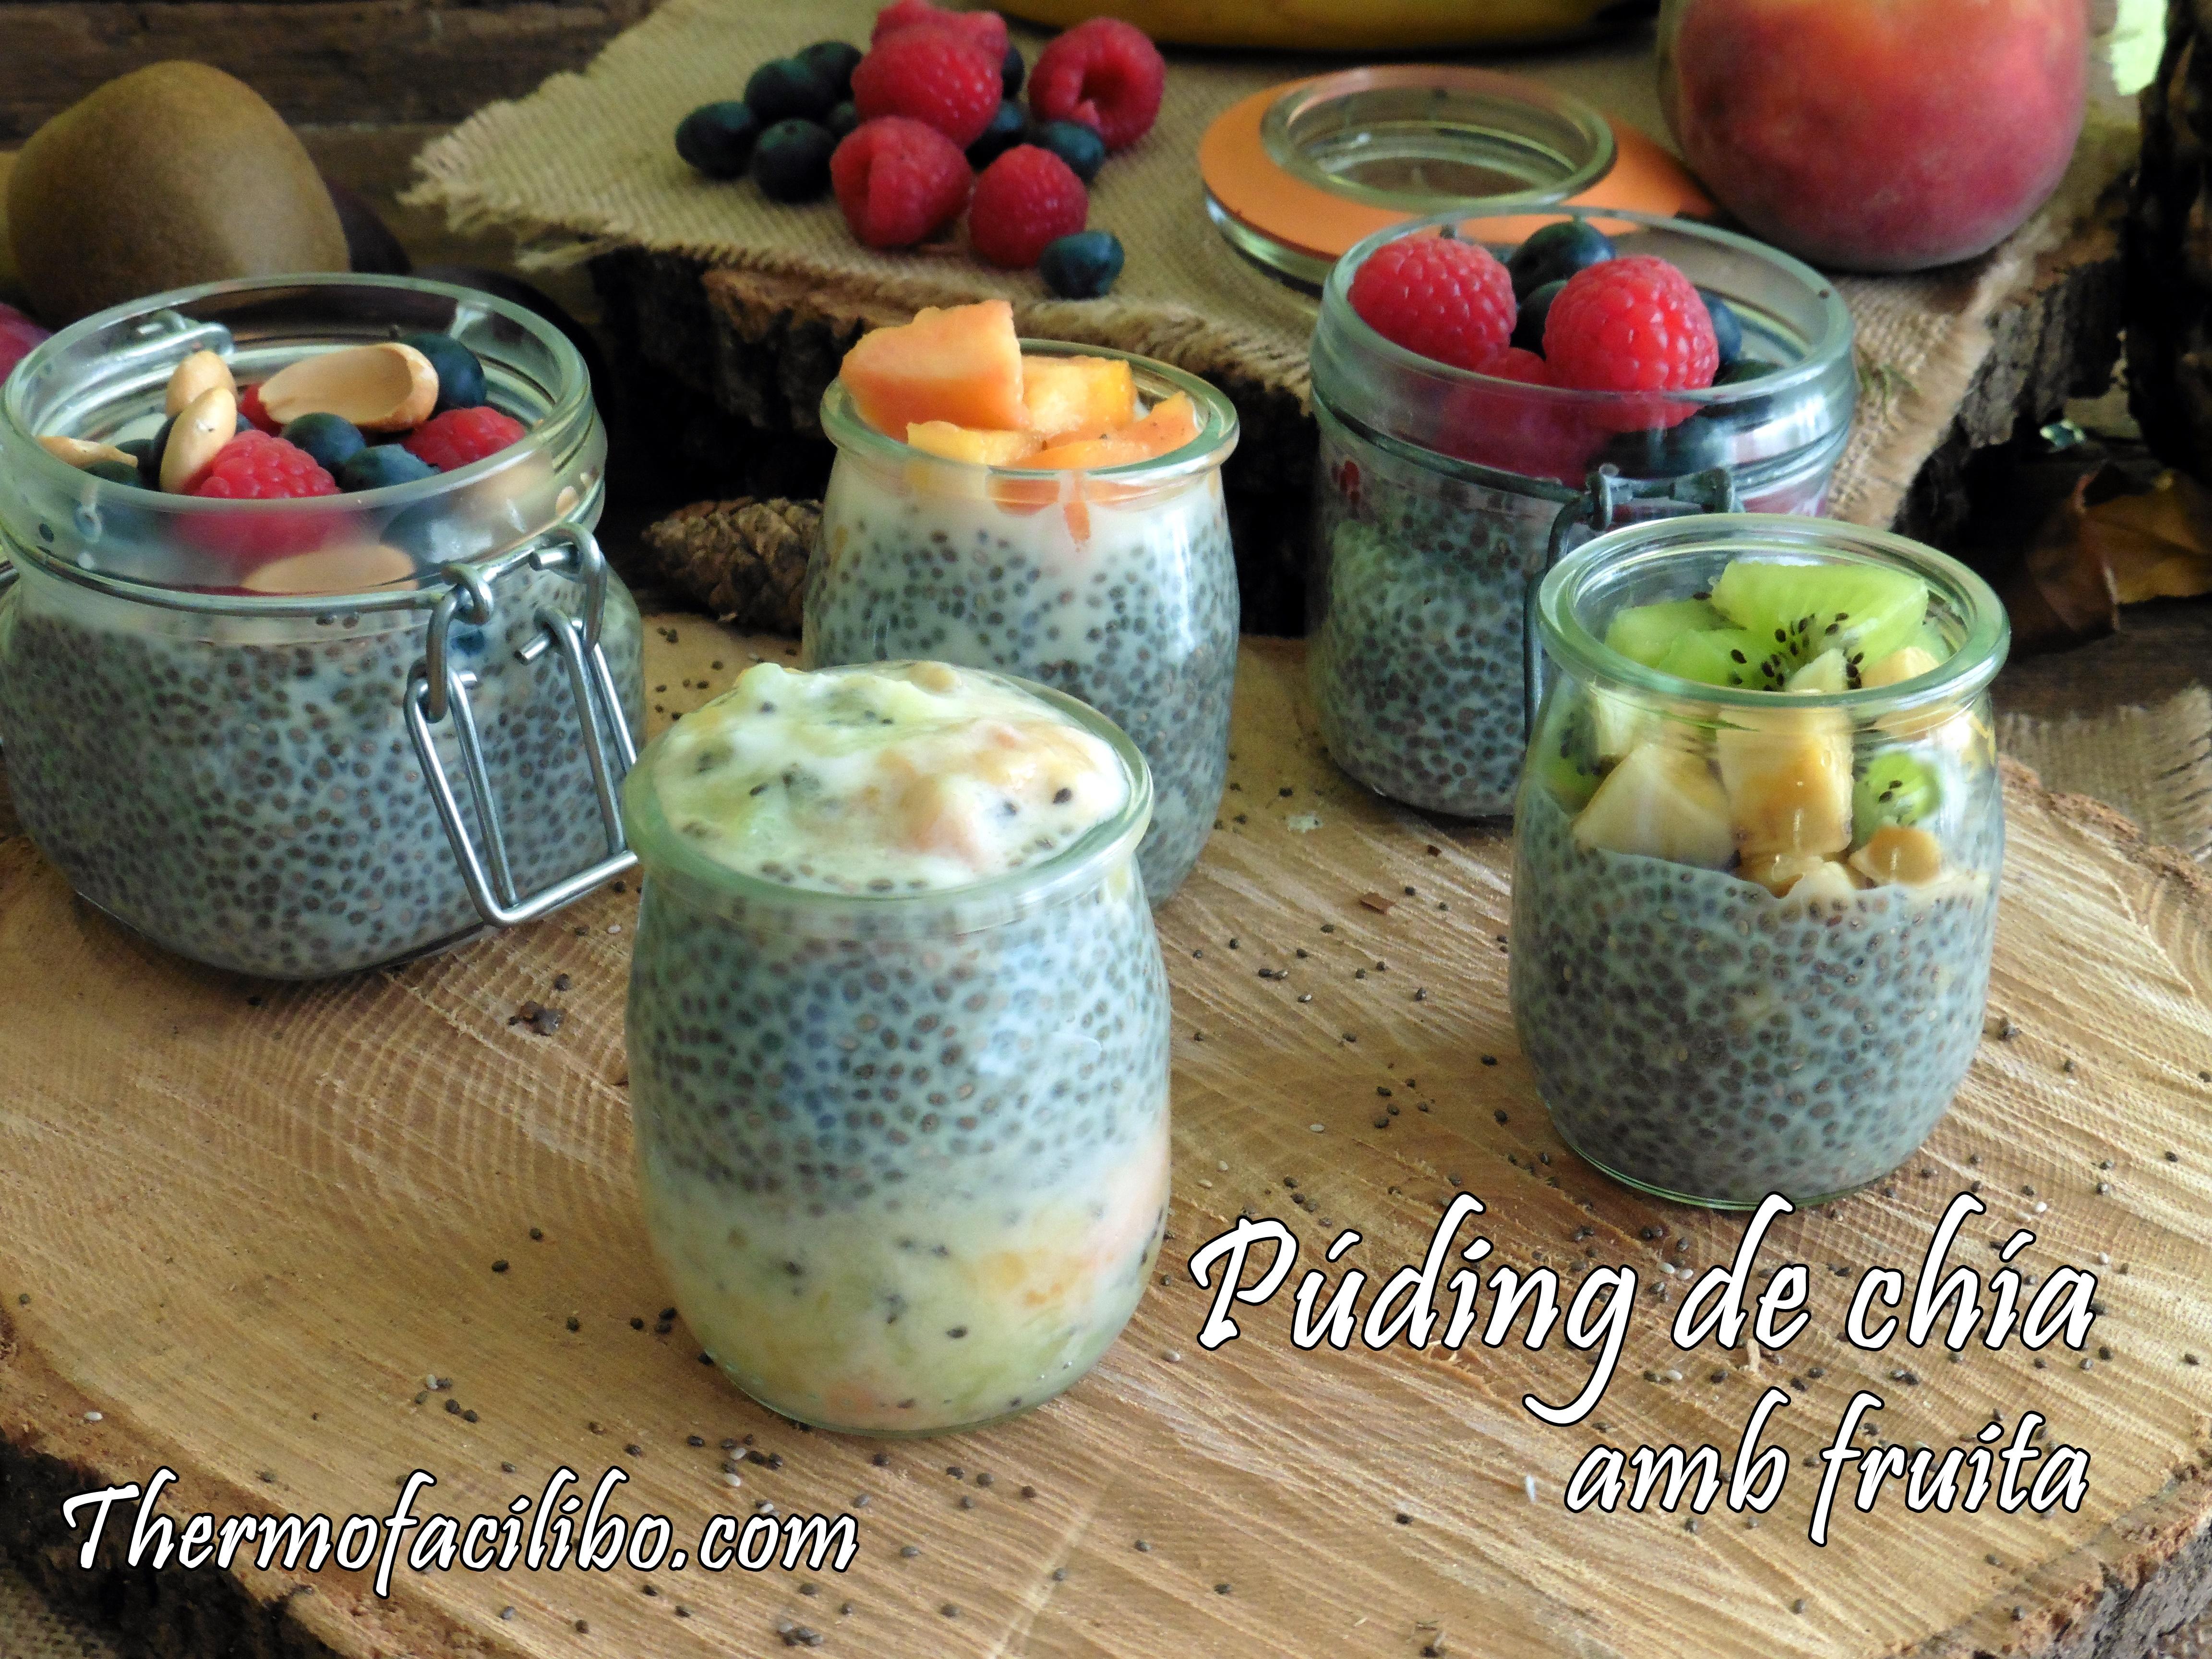 Púding de chía amb fruita.2